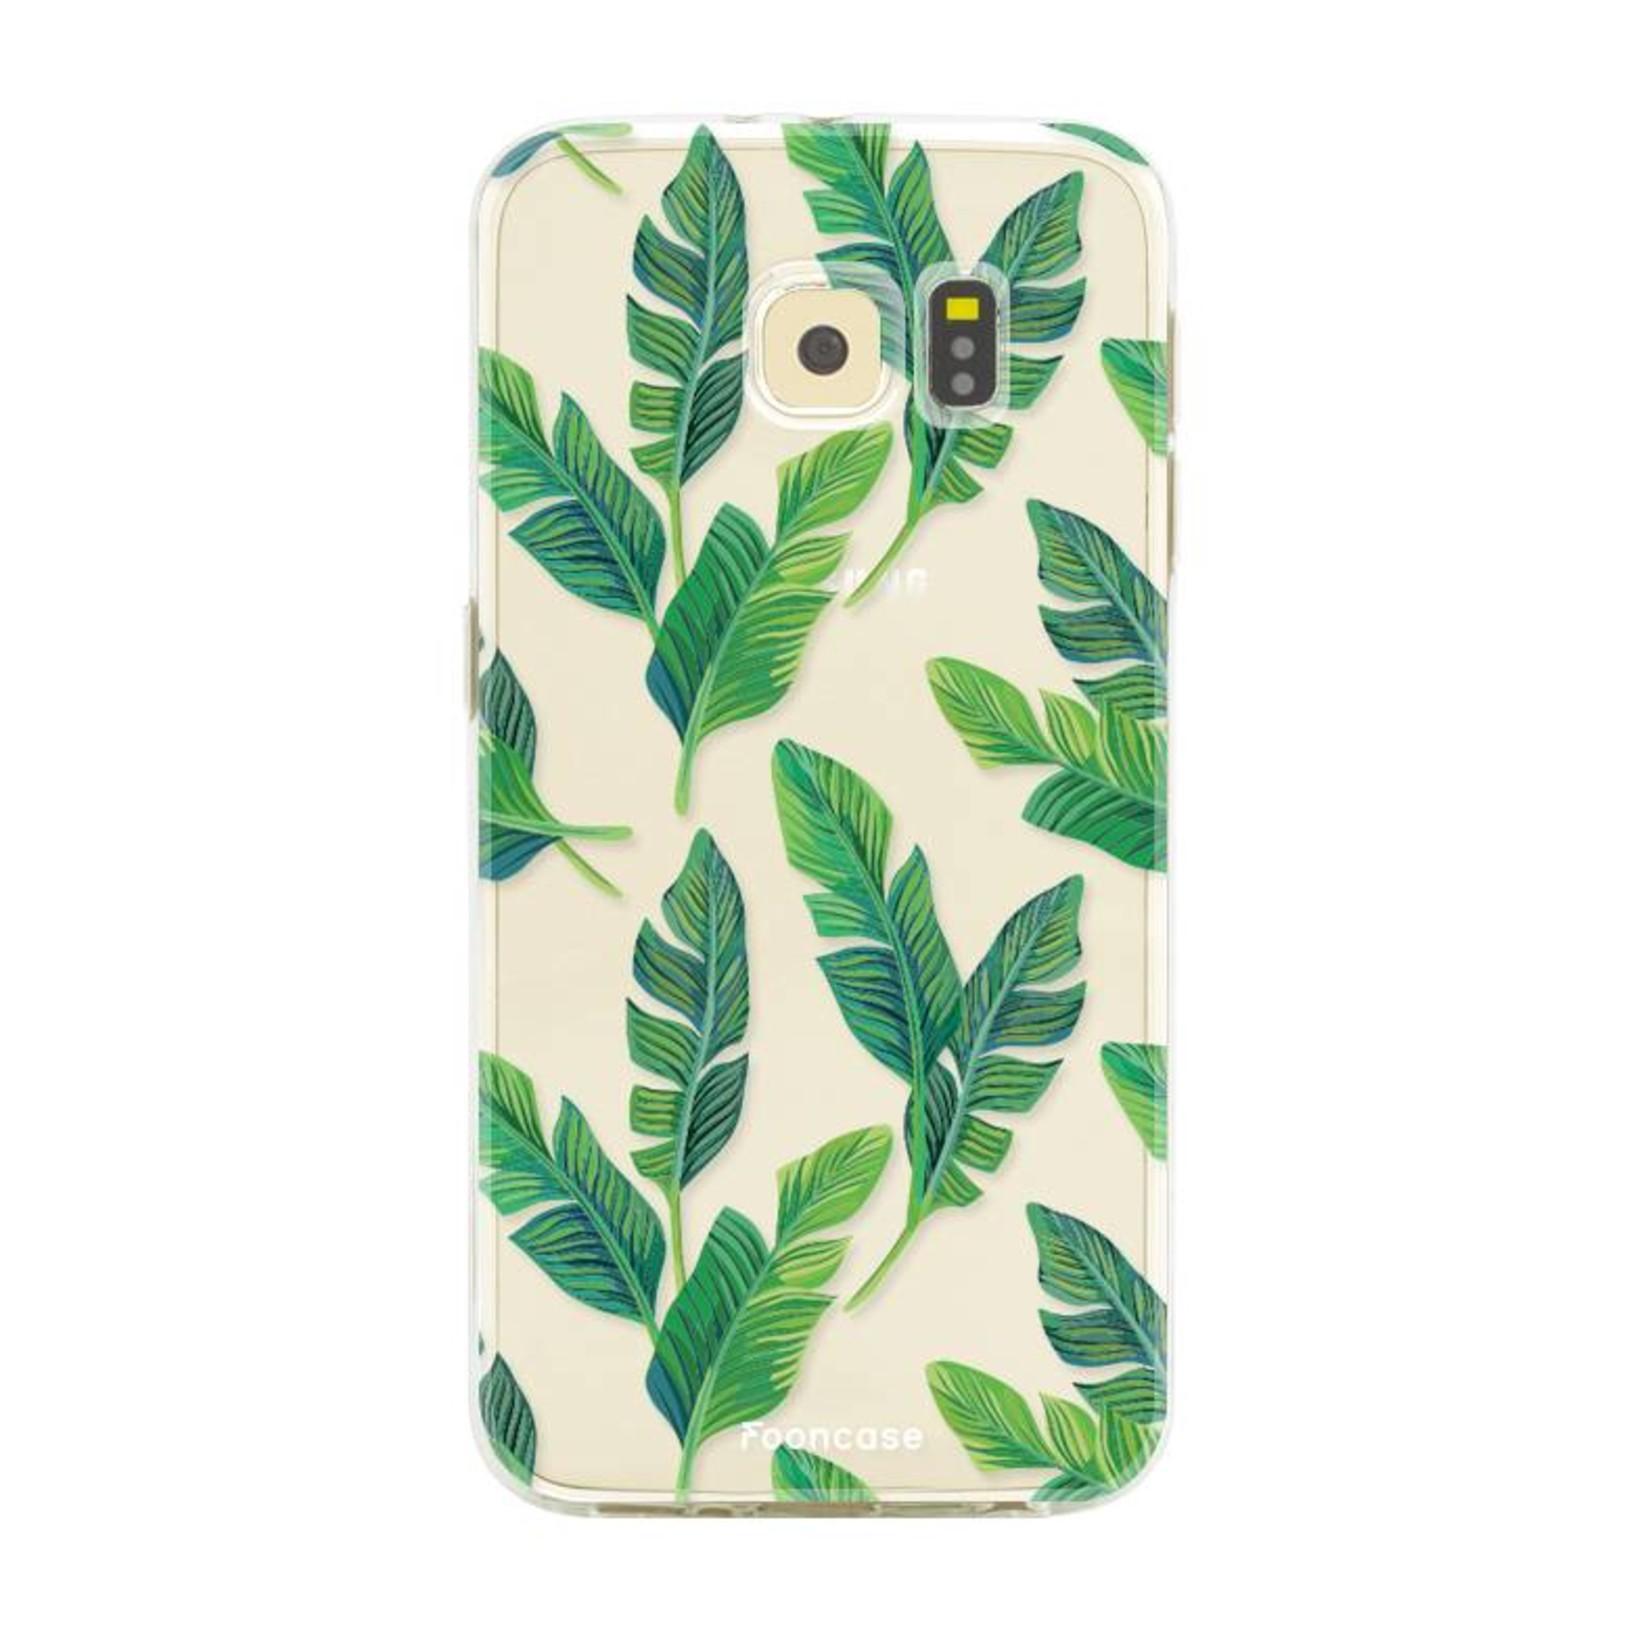 FOONCASE Samsung Galaxy S6 Edge Handyhülle - Bananenblätter